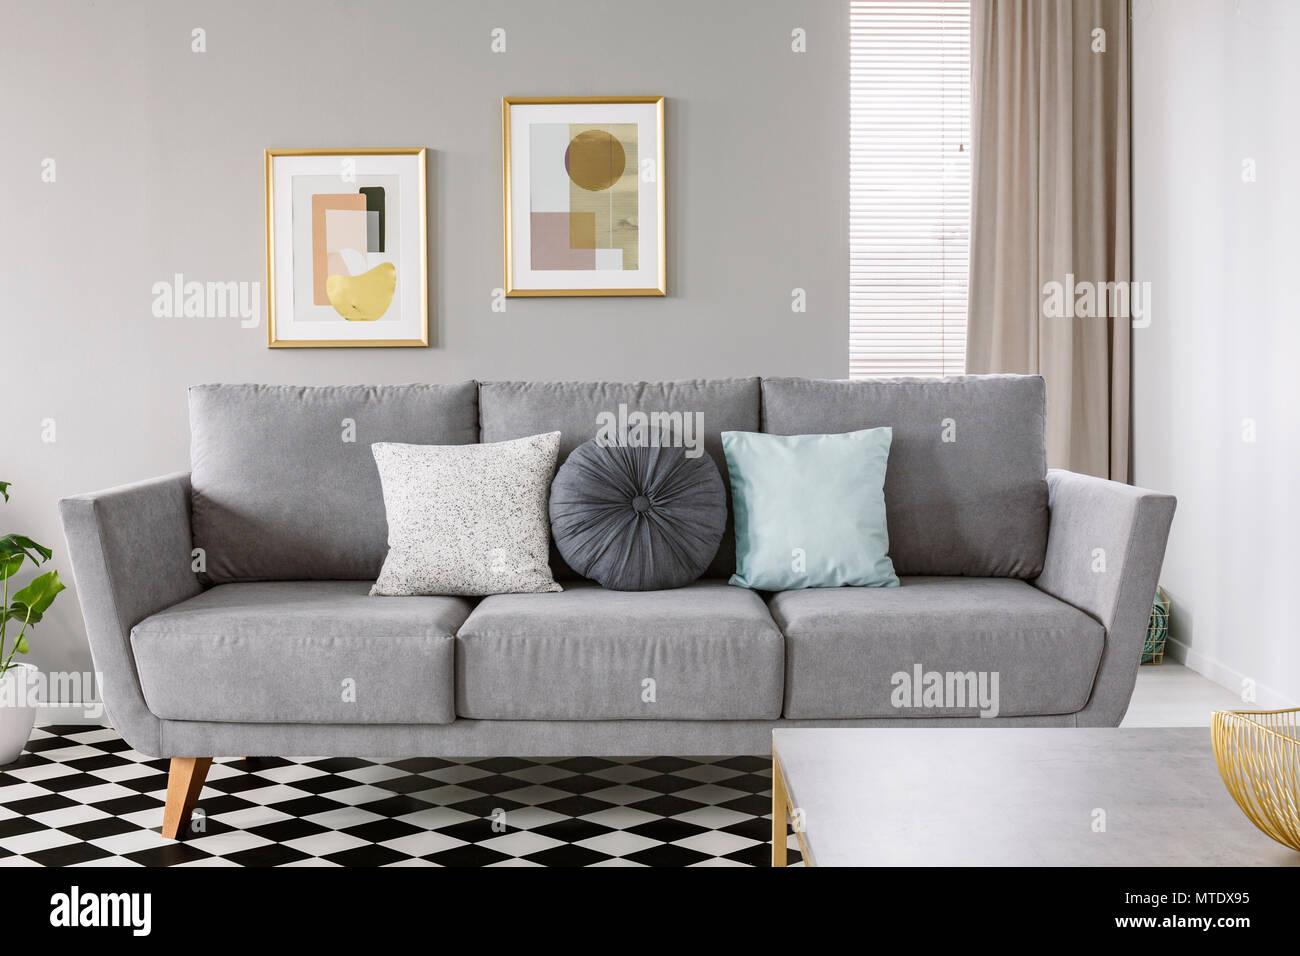 Interior Wall Design Frames Living Room Stock Photos & Interior Wall